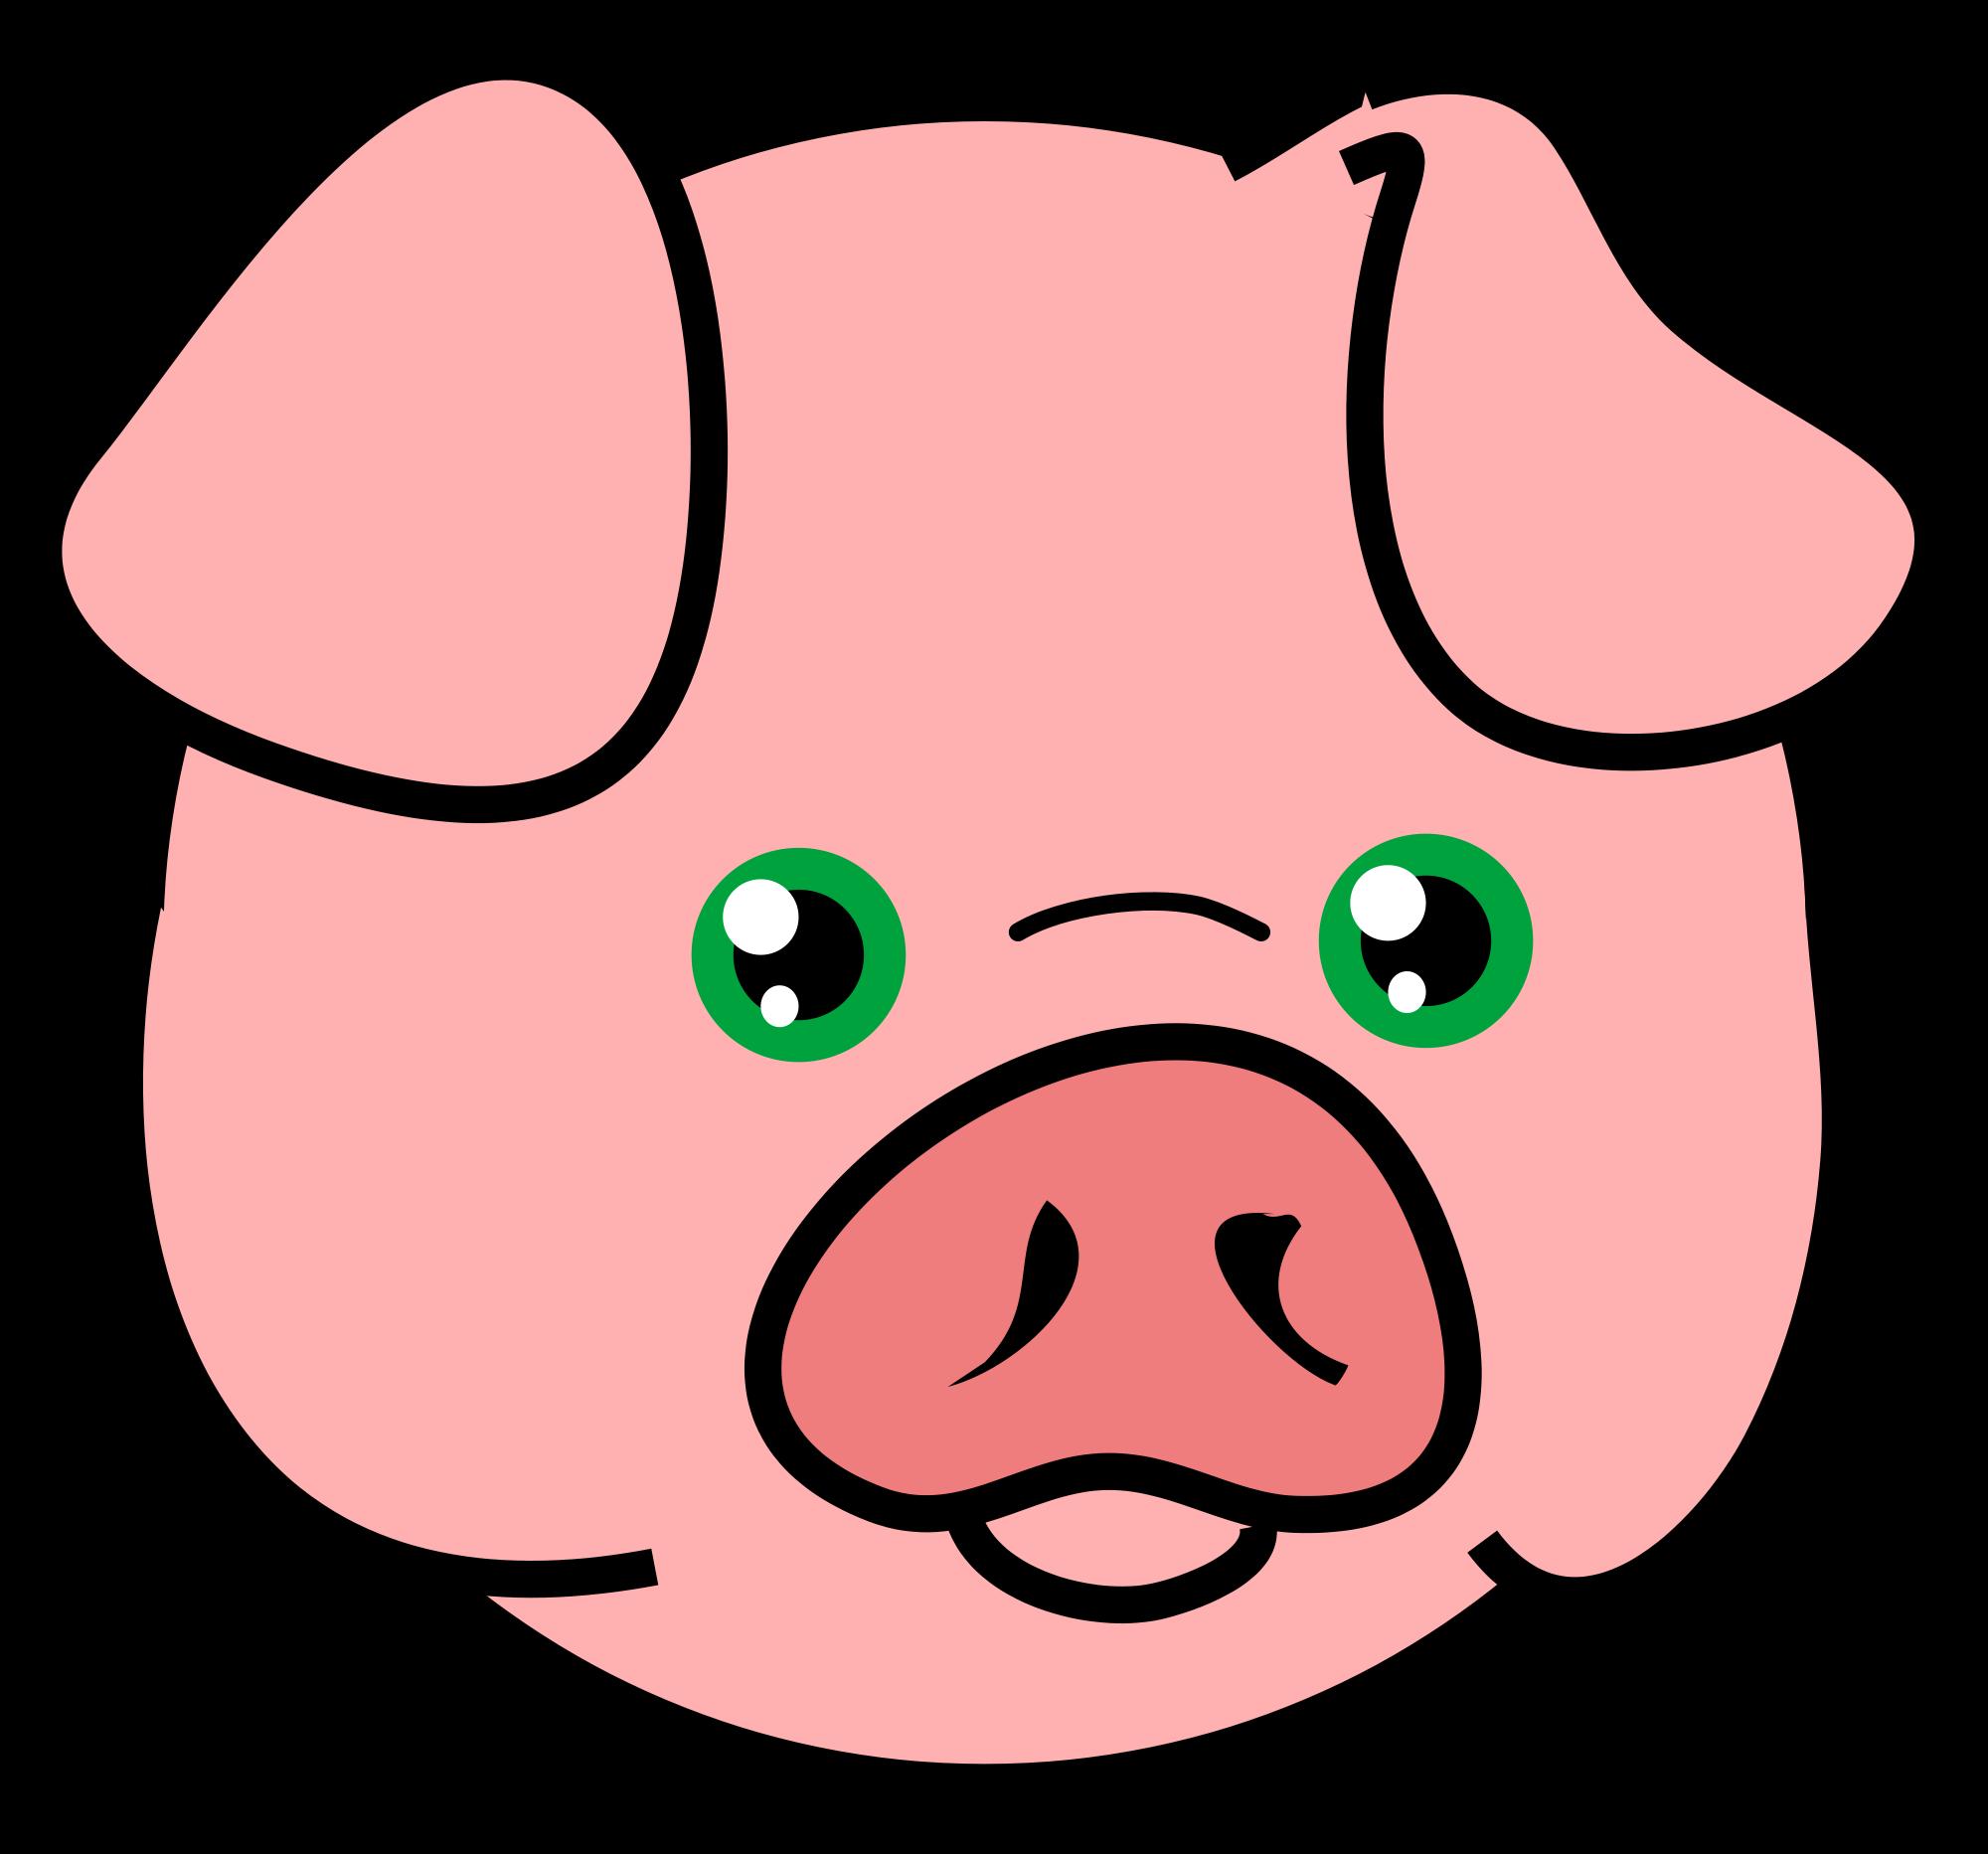 Pig svg #11, Download drawings